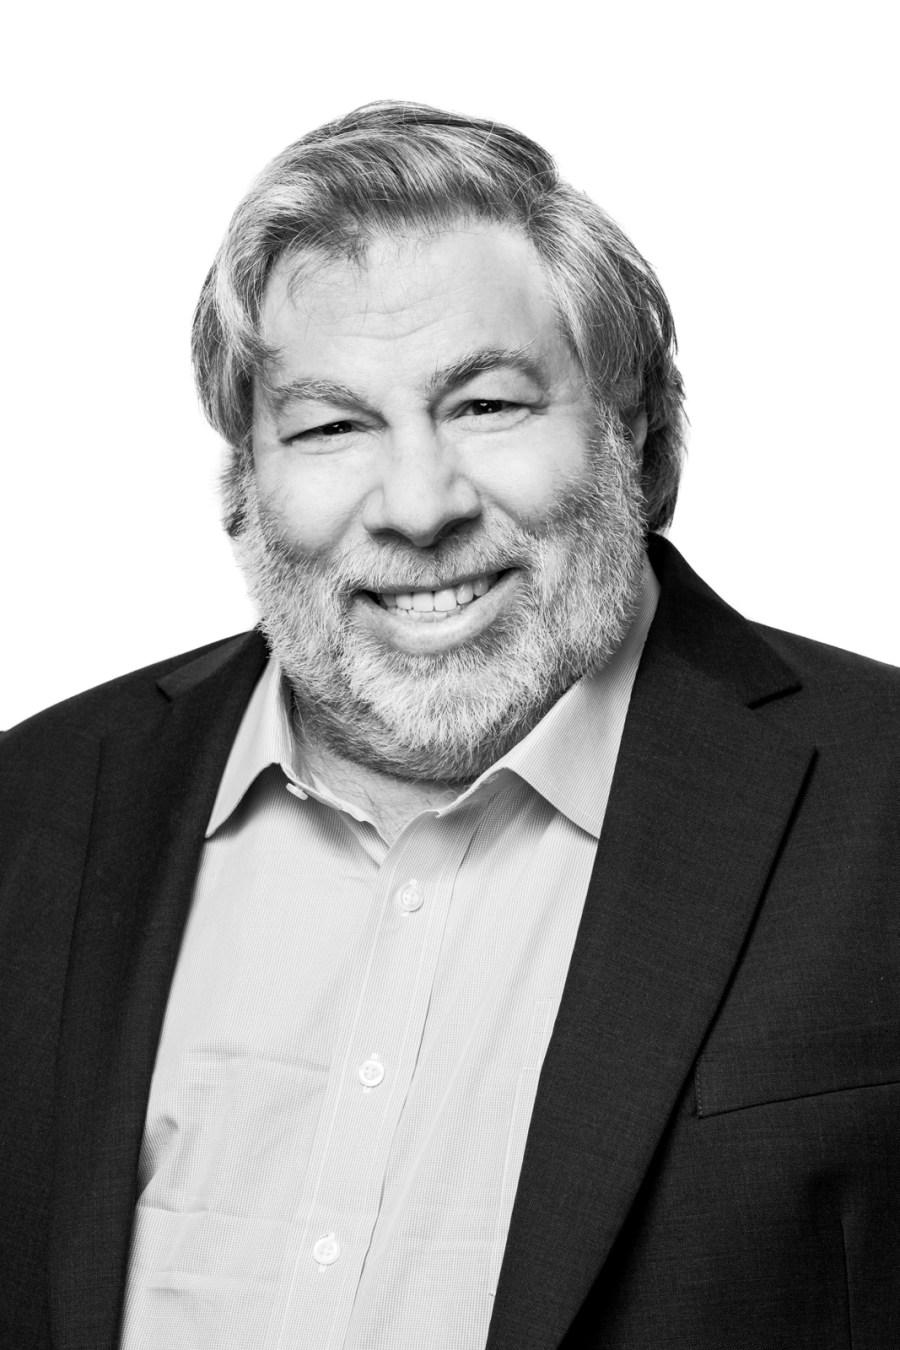 Steve Wozniak for Fujifilm - Image by Dan Taylor - dan@heisenbergmedia.com-1